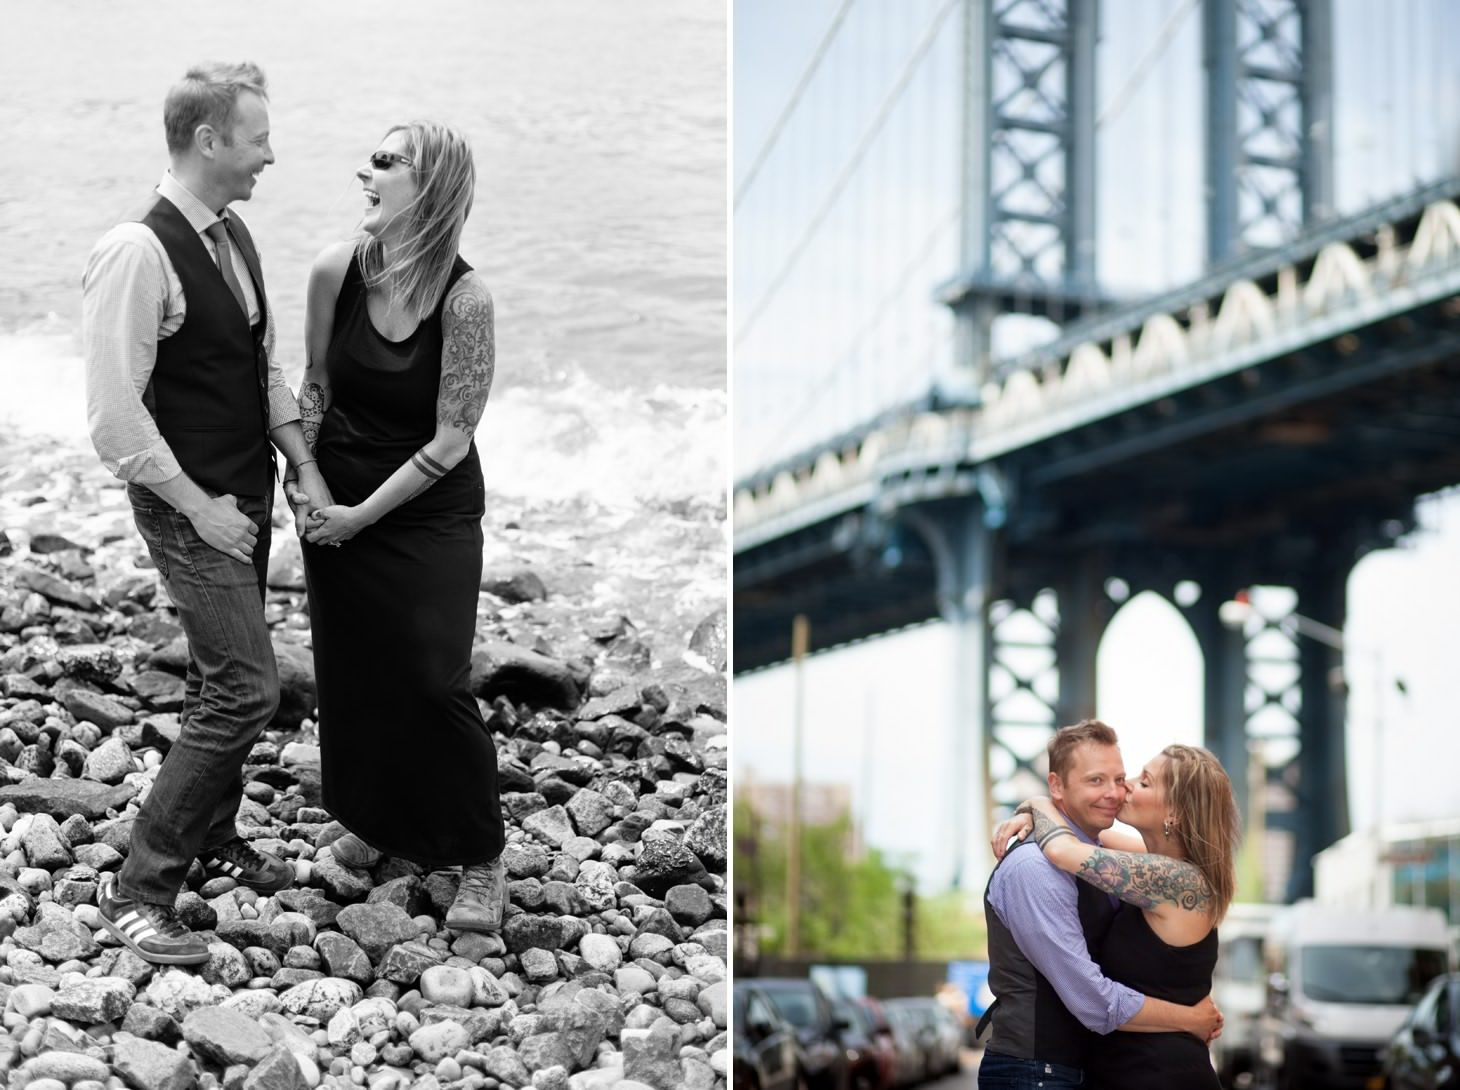 nyc-wedding-photographer-brooklyn-bridge-smitten-chickens-engagement-brooklyn-bridge-003.jpg